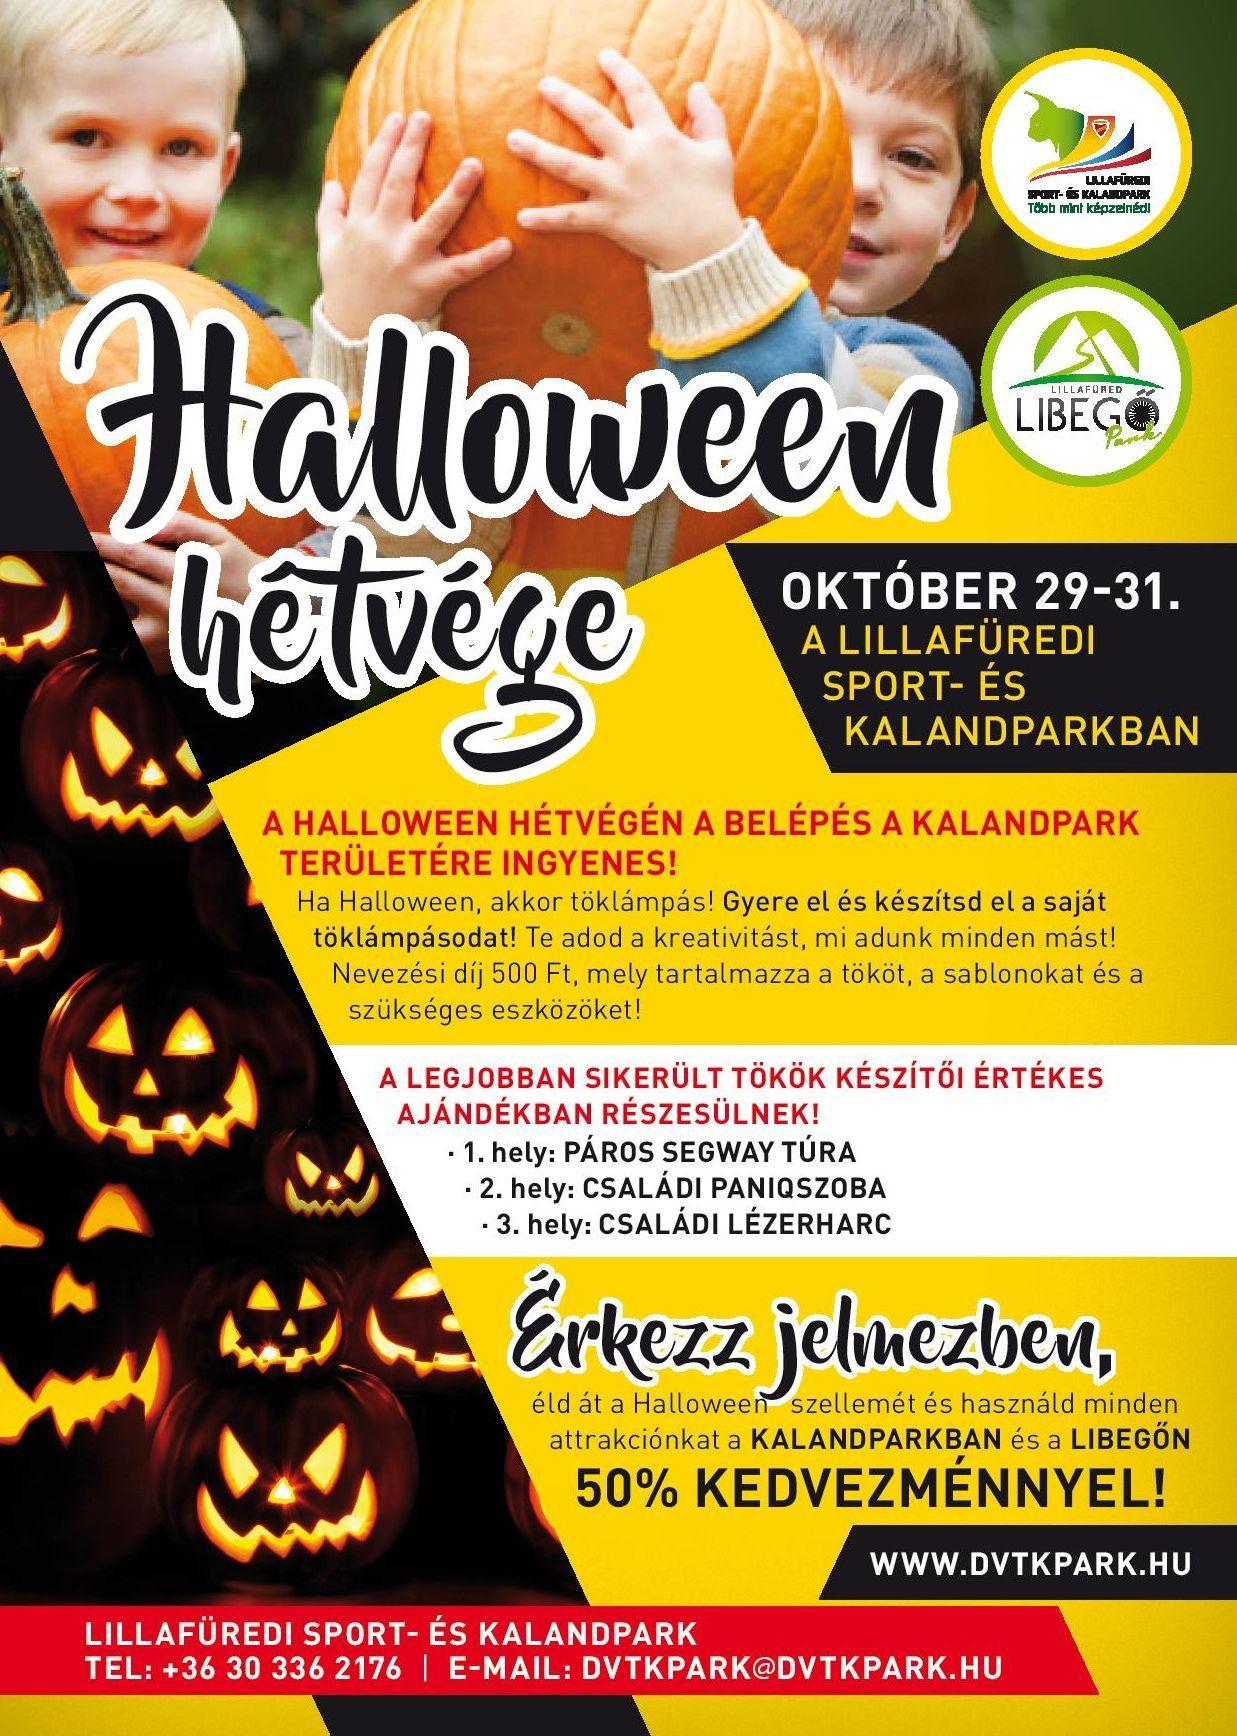 kalandpark_halloween_tokfaragas_a4_plakat_1_-page-0012.jpg